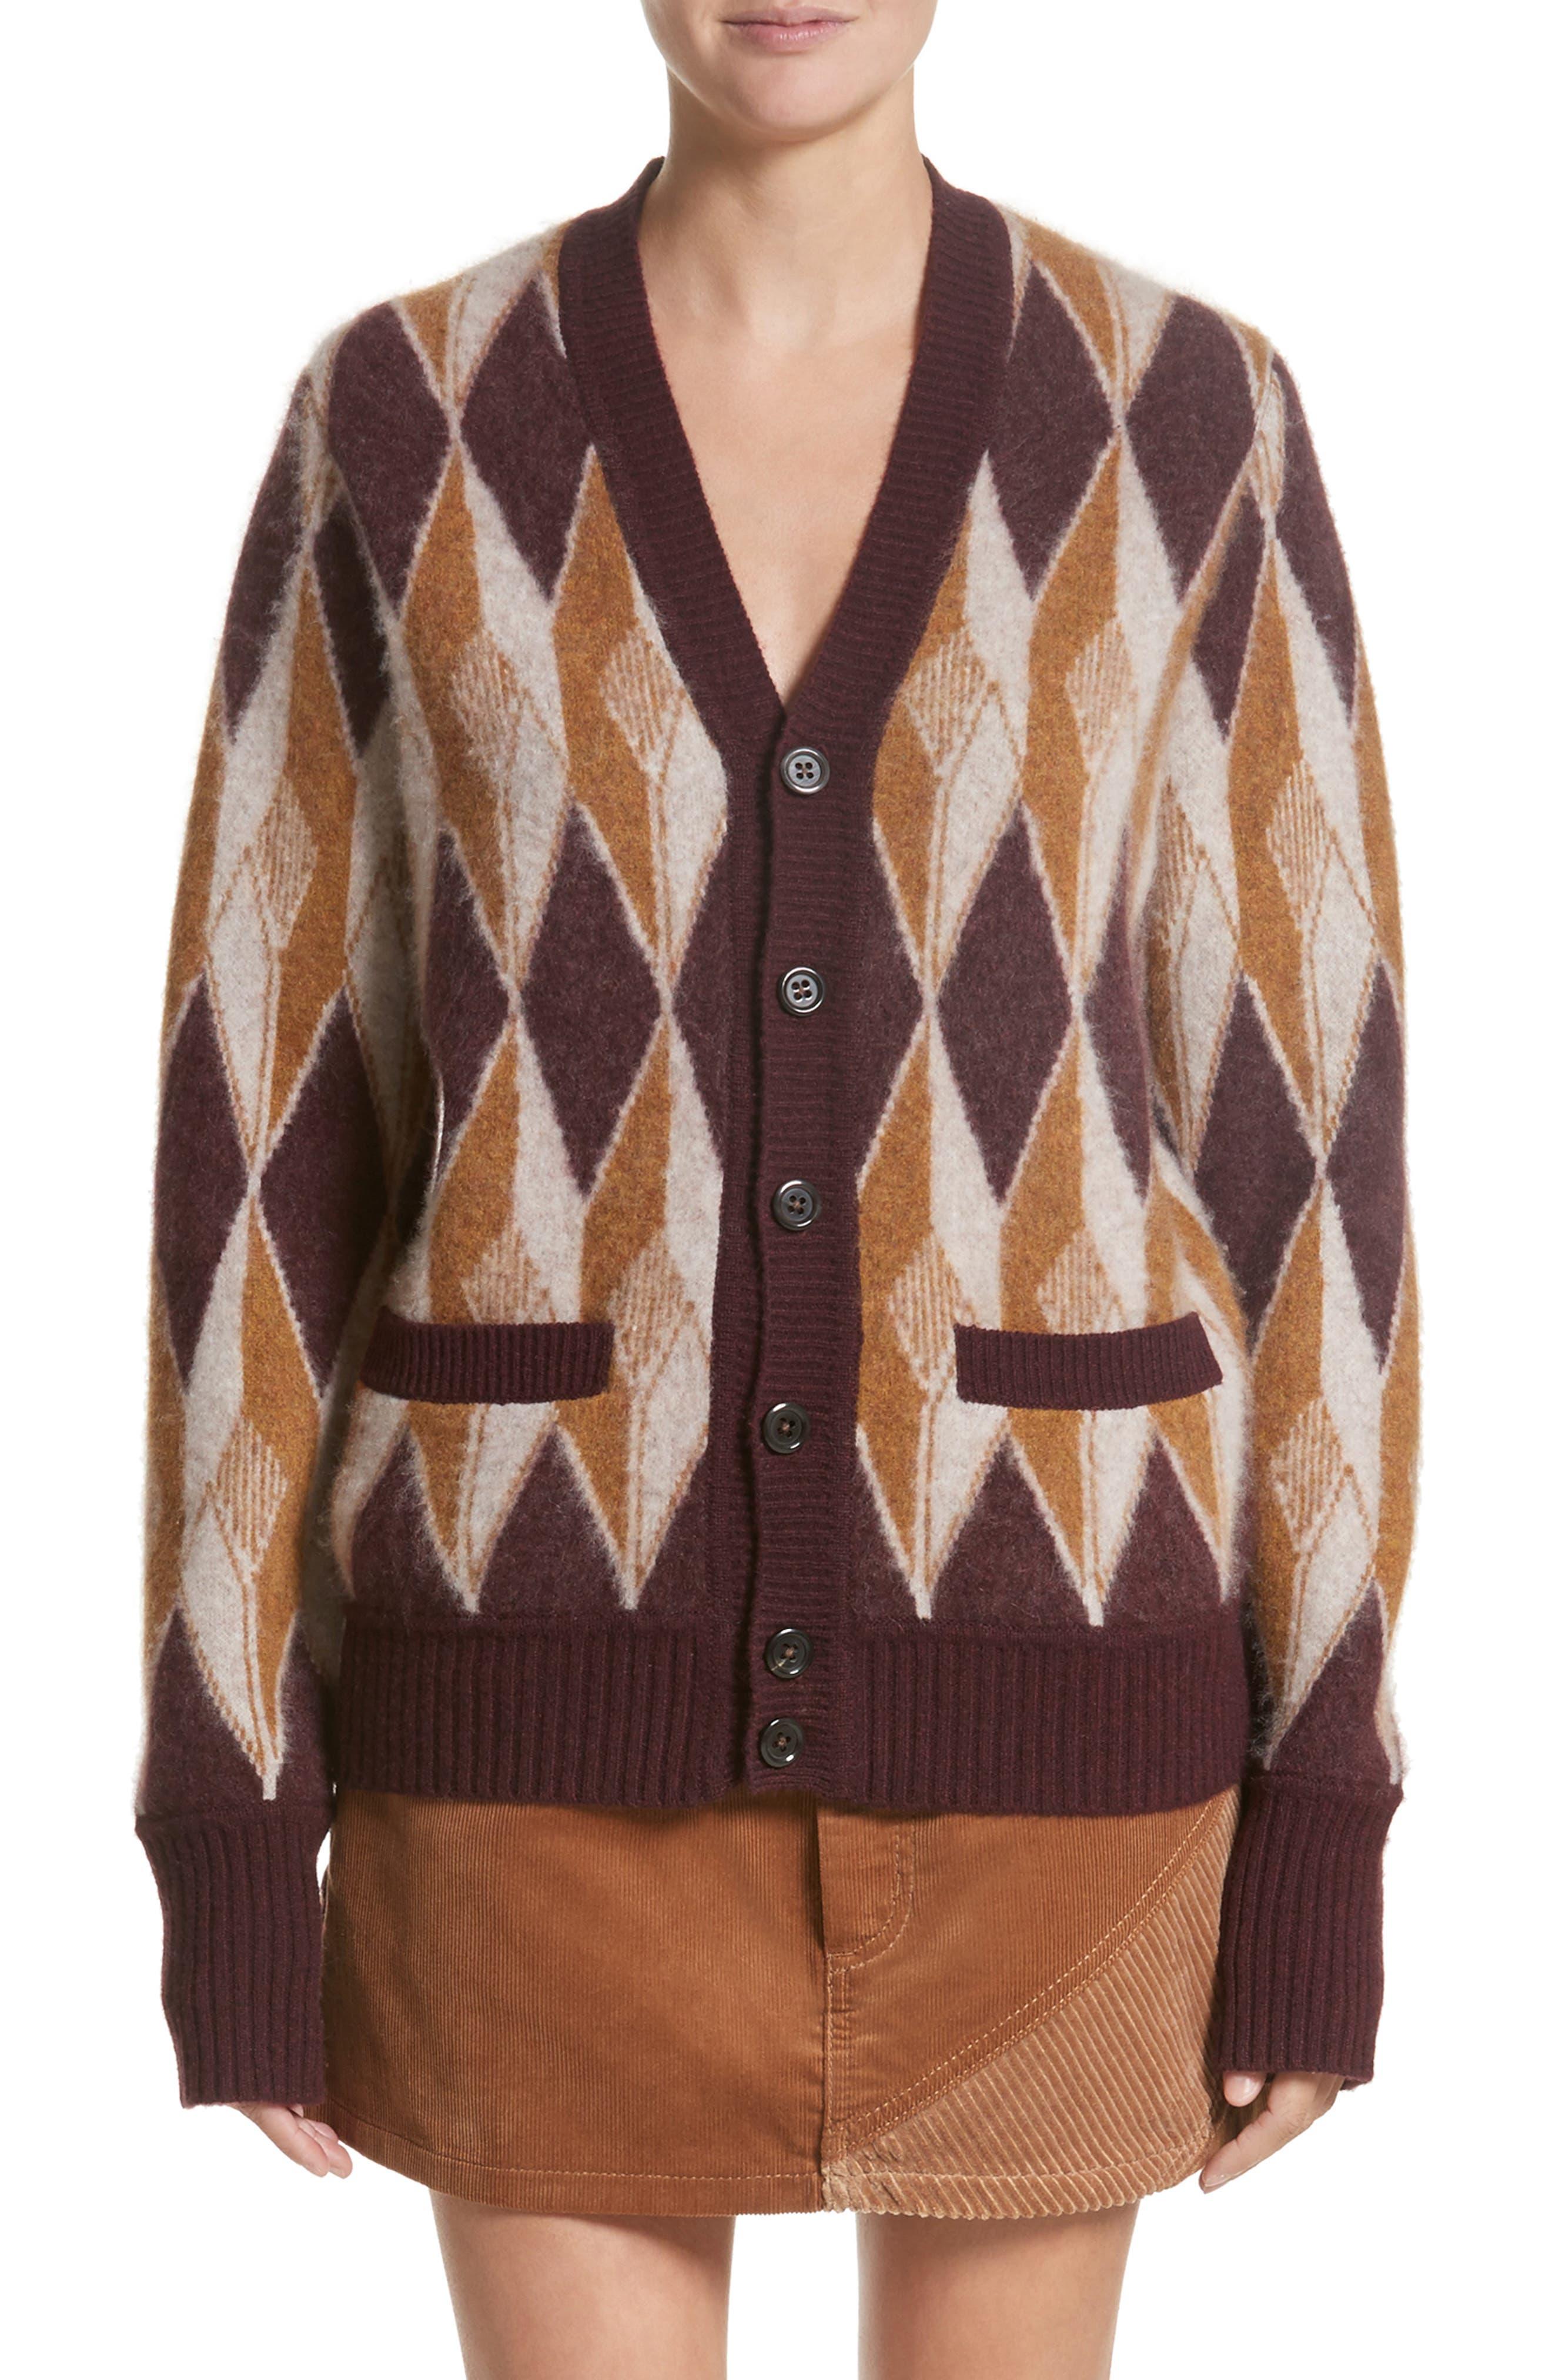 Main Image - MARC JACOBS Boiled Cashmere Jacquard Button Cardigan